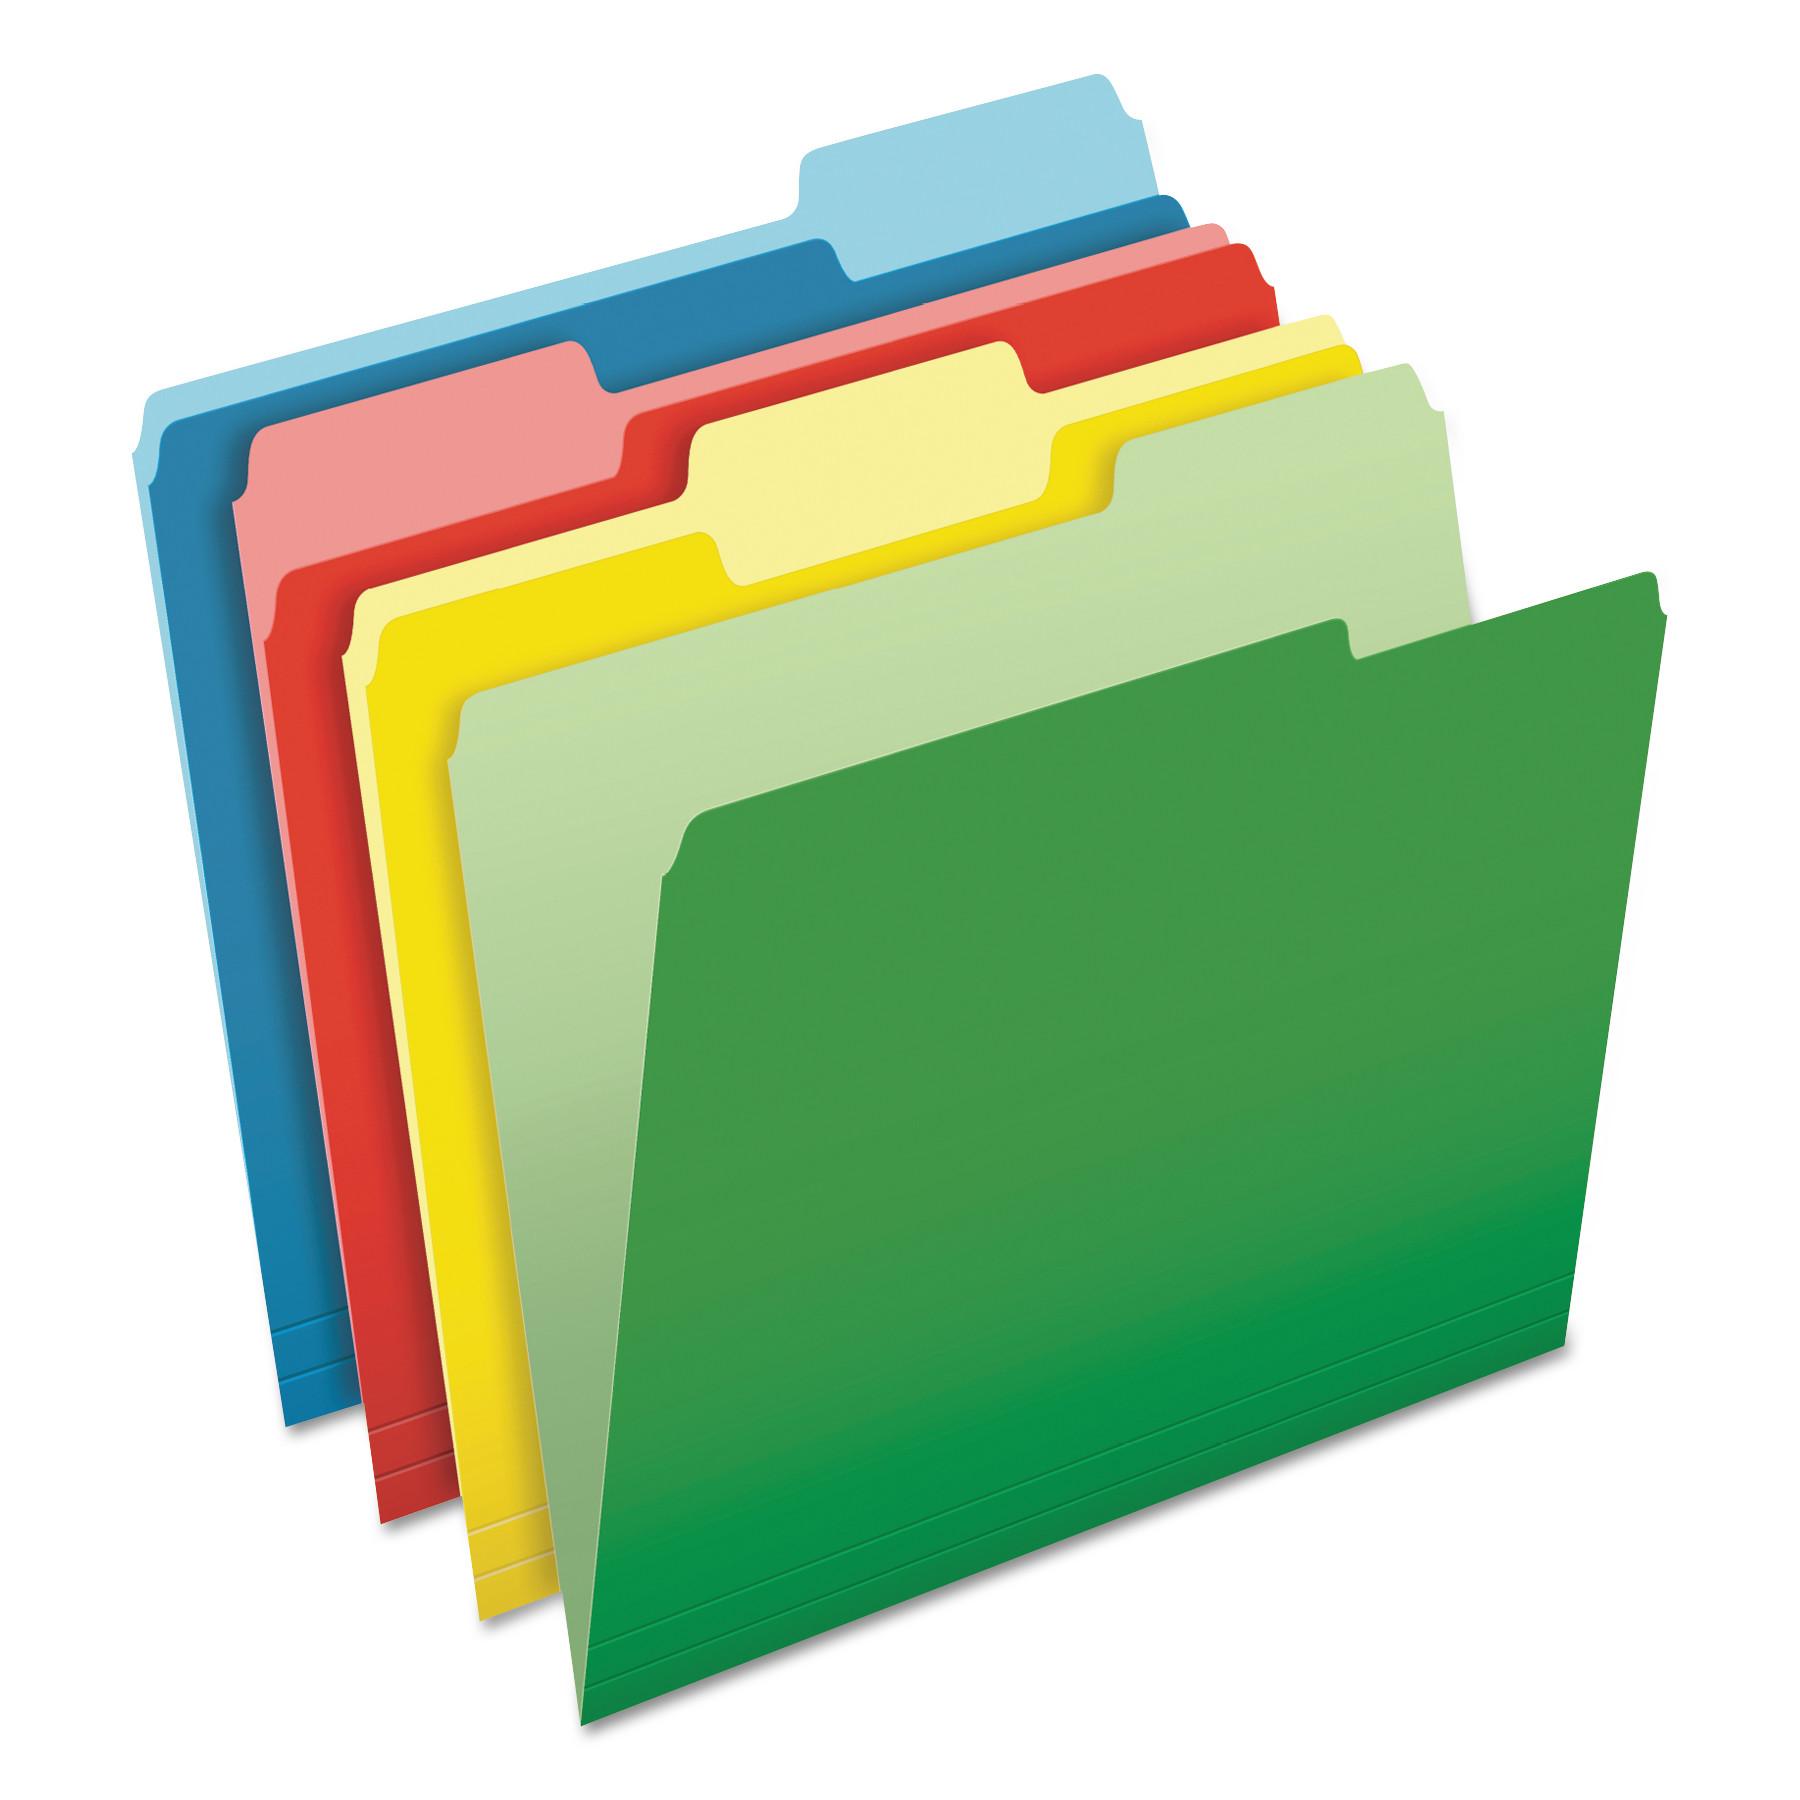 Pendaflex CutLess File Folders, 1/3 Cut Top Tab, Letter, Assorted, 100/Box -PFX48440